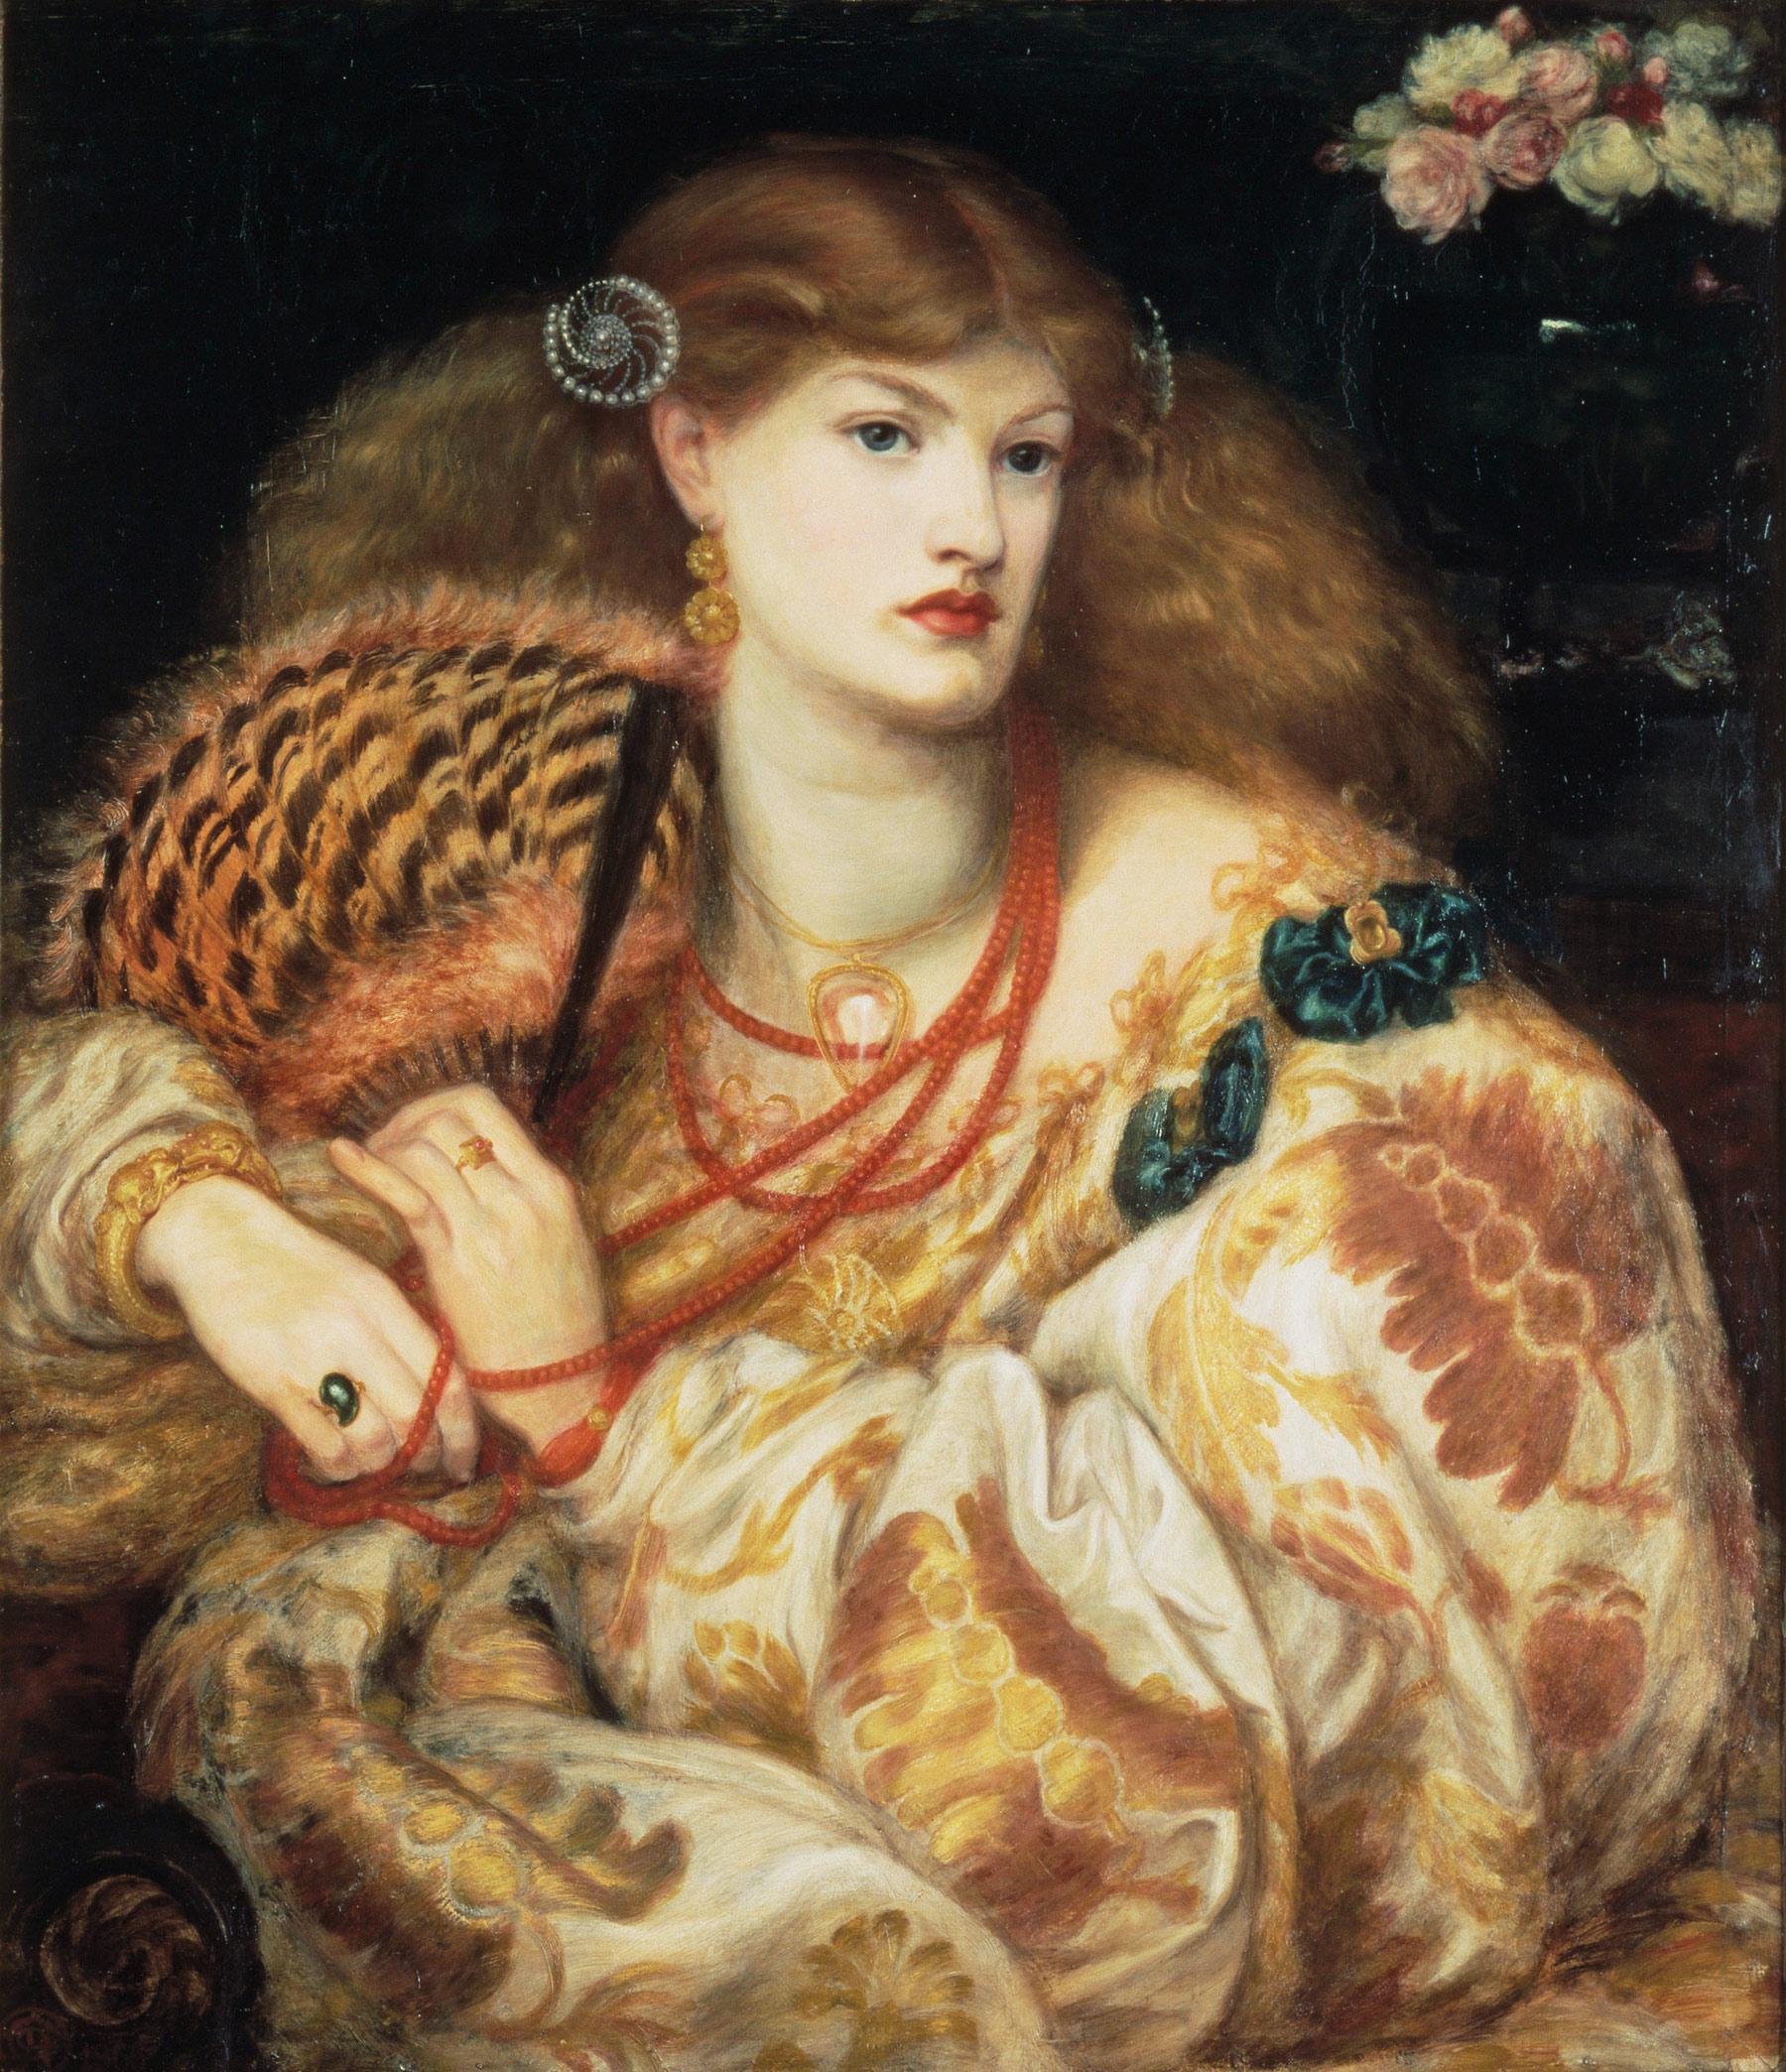 Dante Gabriel Rossetti, Monna Vanna (1866; olio su tela, 88,9 x 86,4 cm; Londra, Tate Britain)